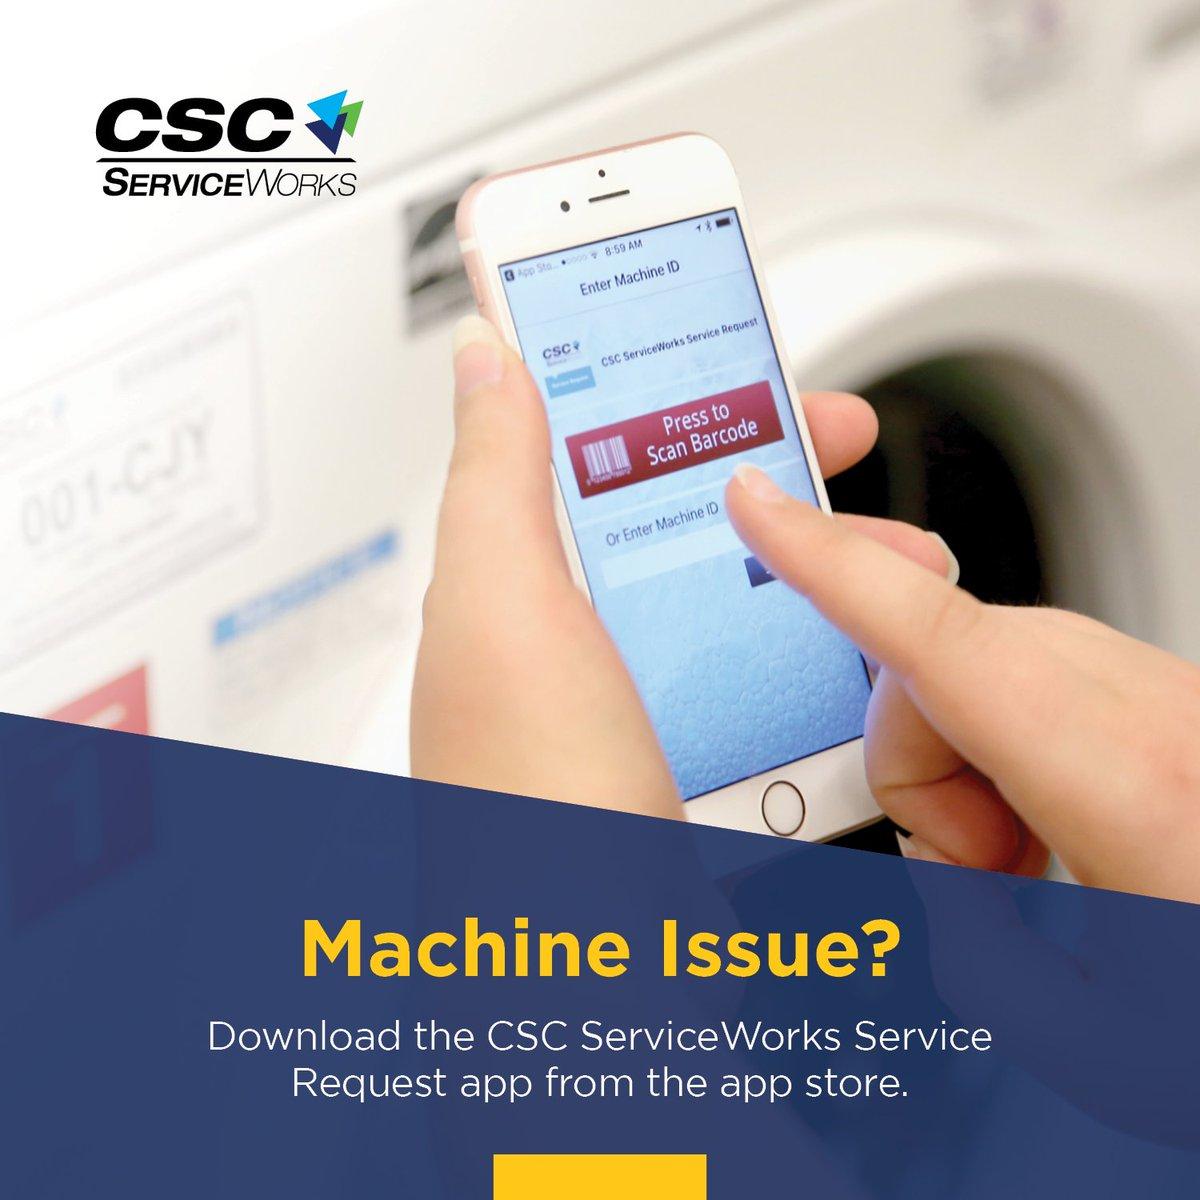 CSC ServiceWorks on Twitter: